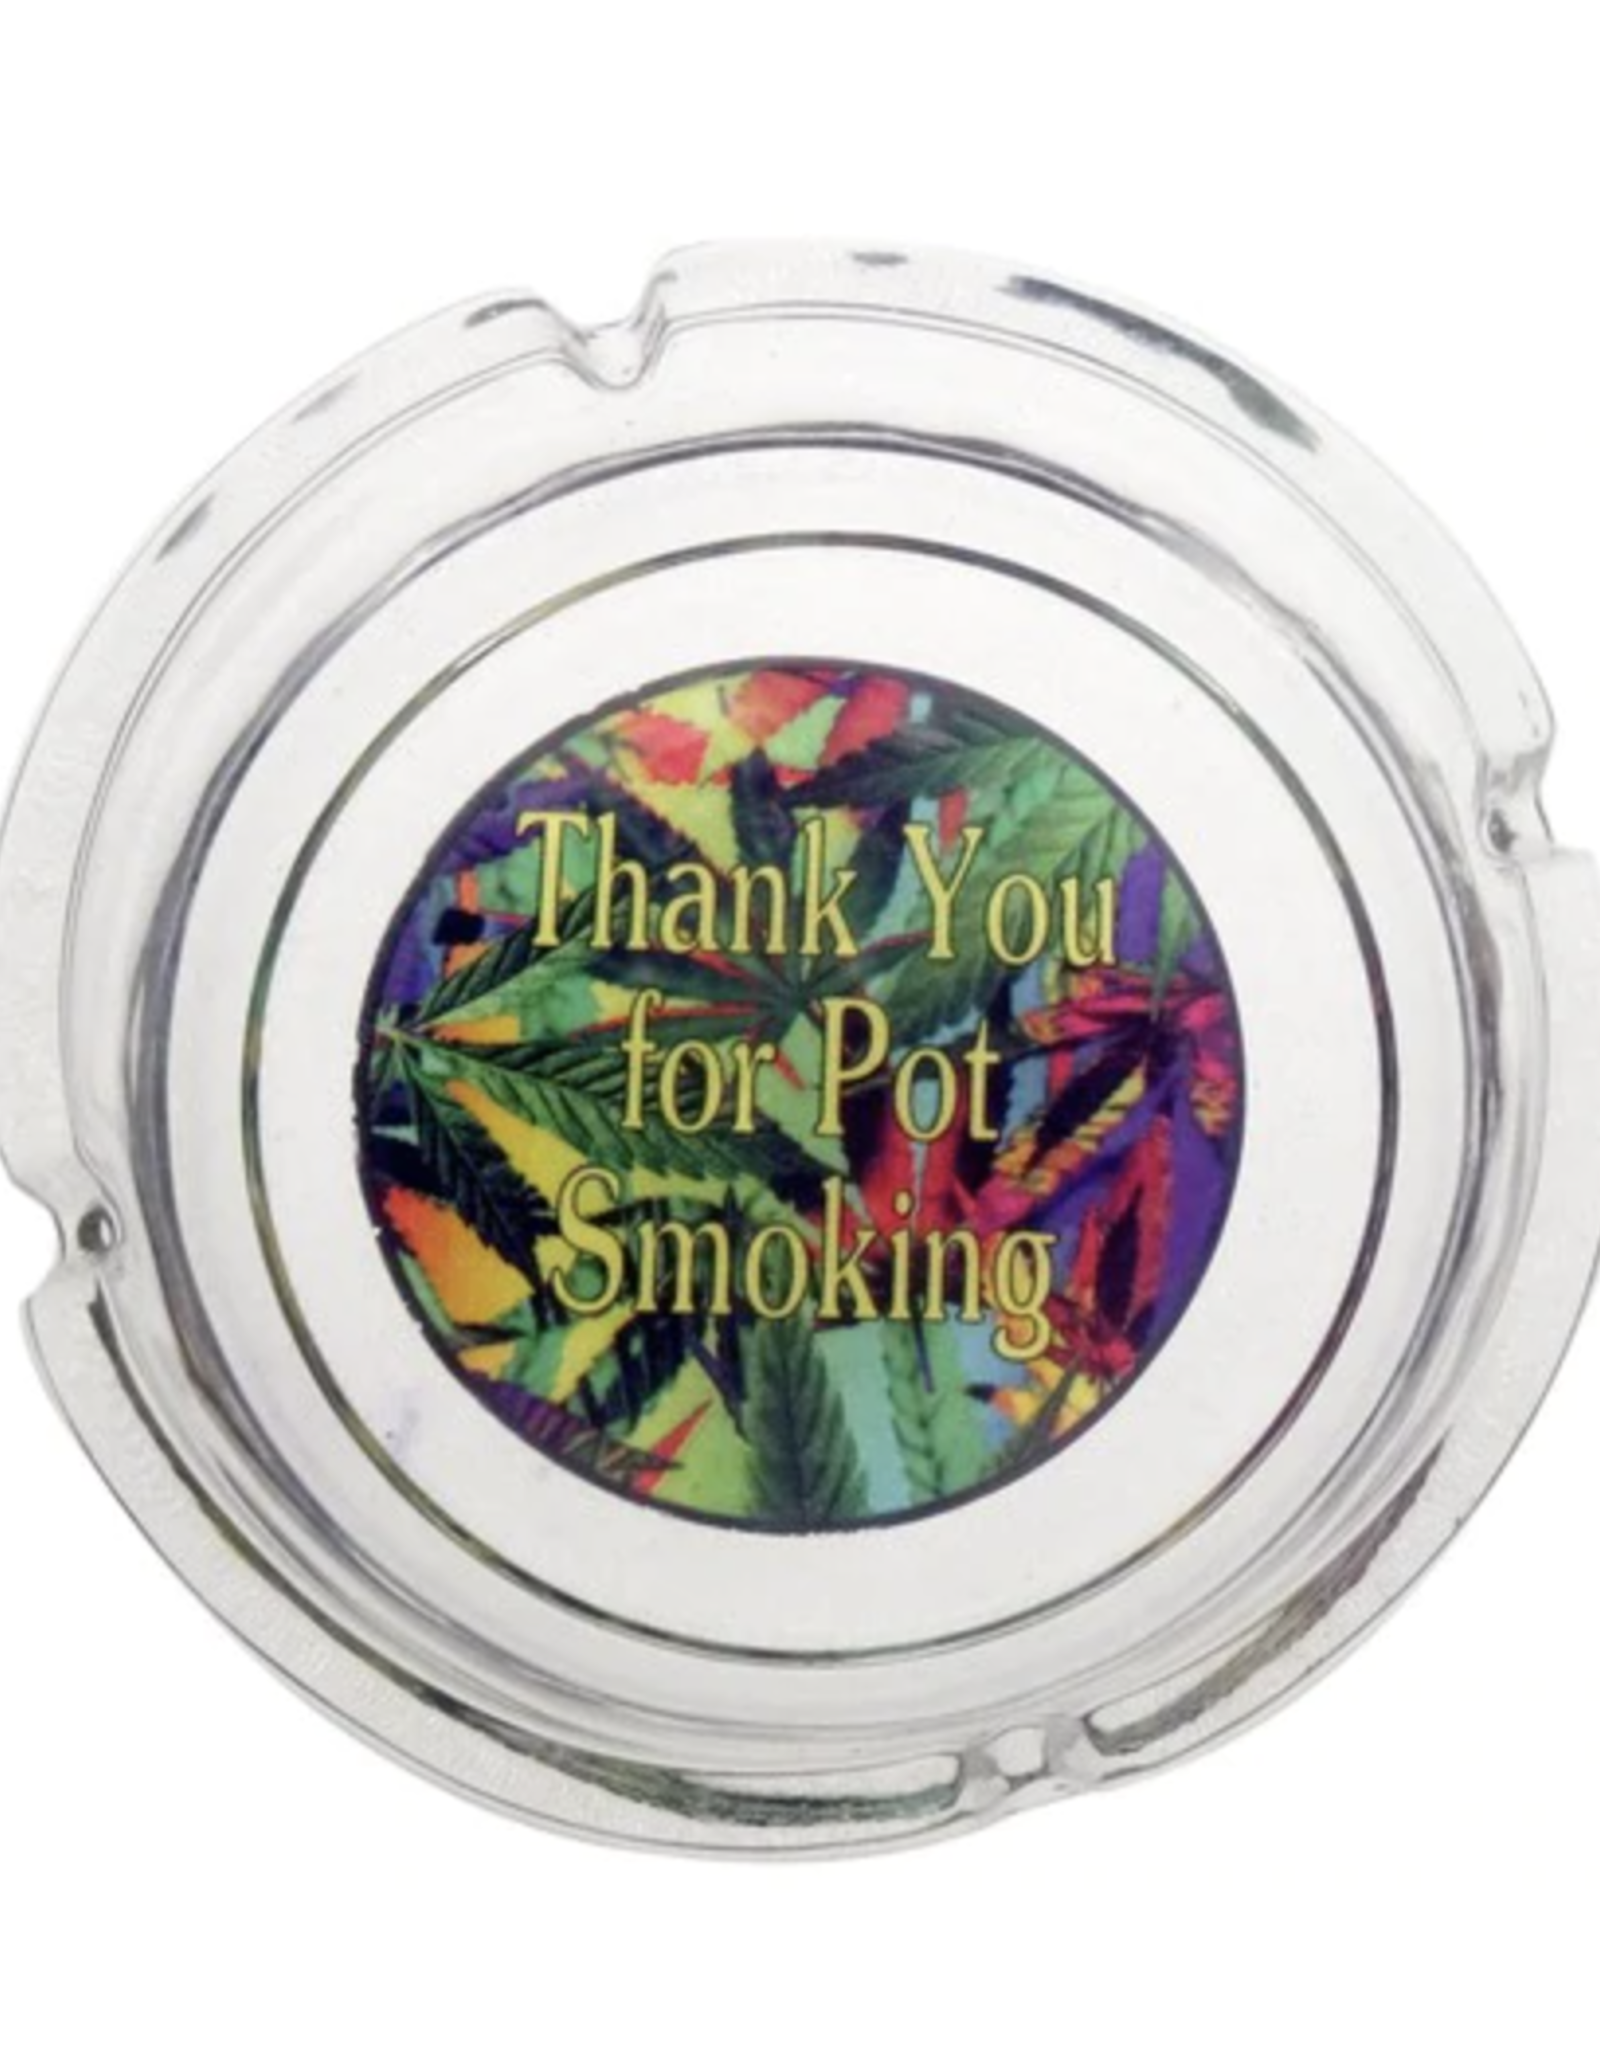 "4"" Glass Ashtray - Thank You for Pot Smoking"